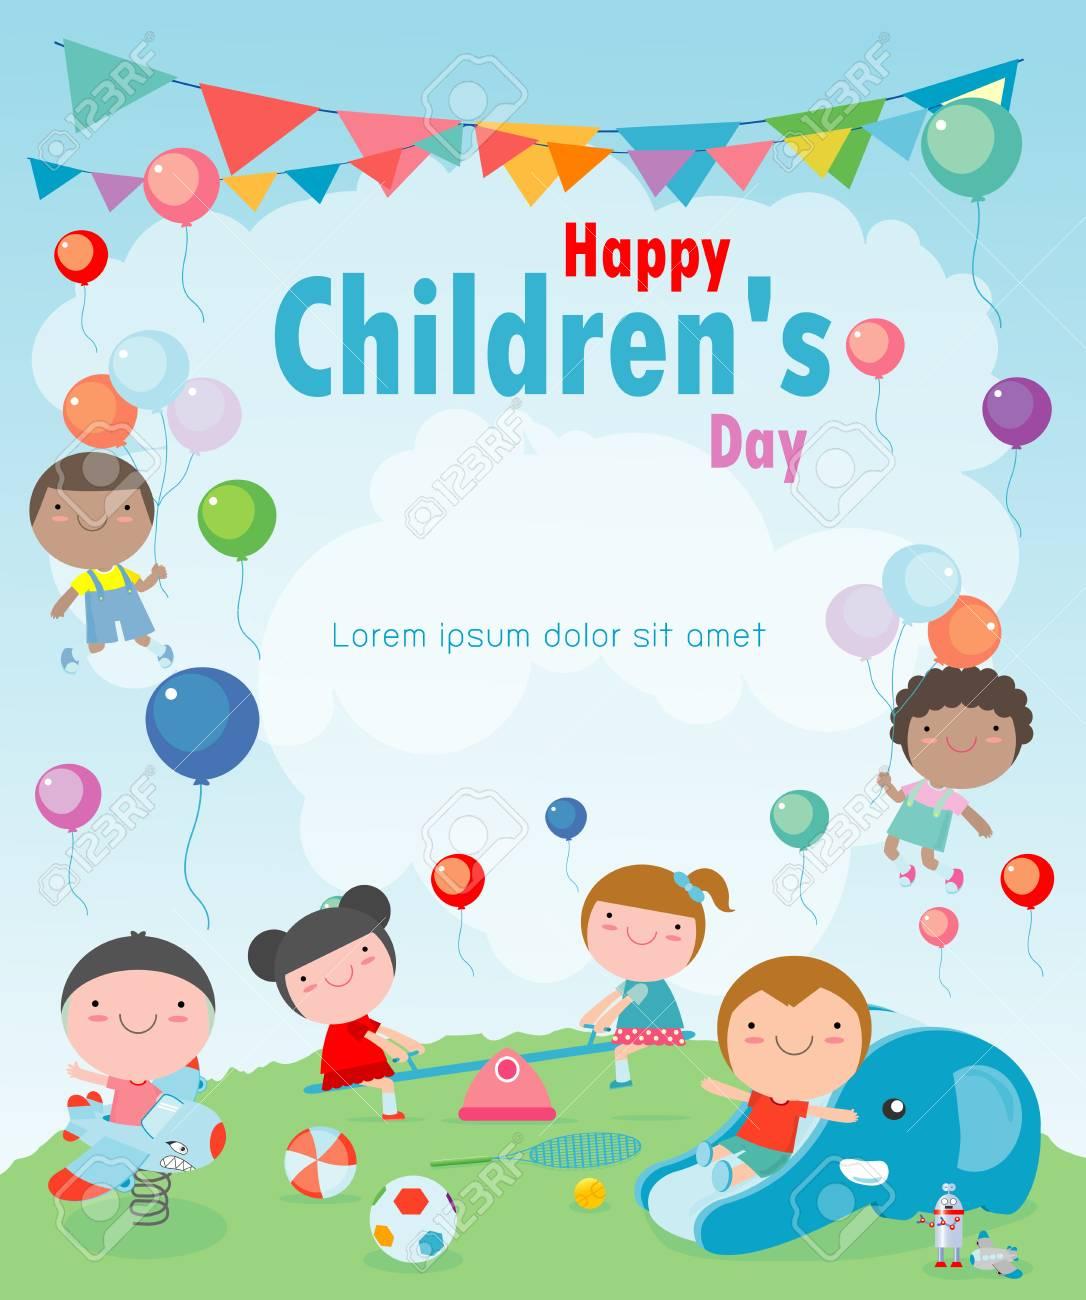 Happy children's day background, vector illustration - 113128049